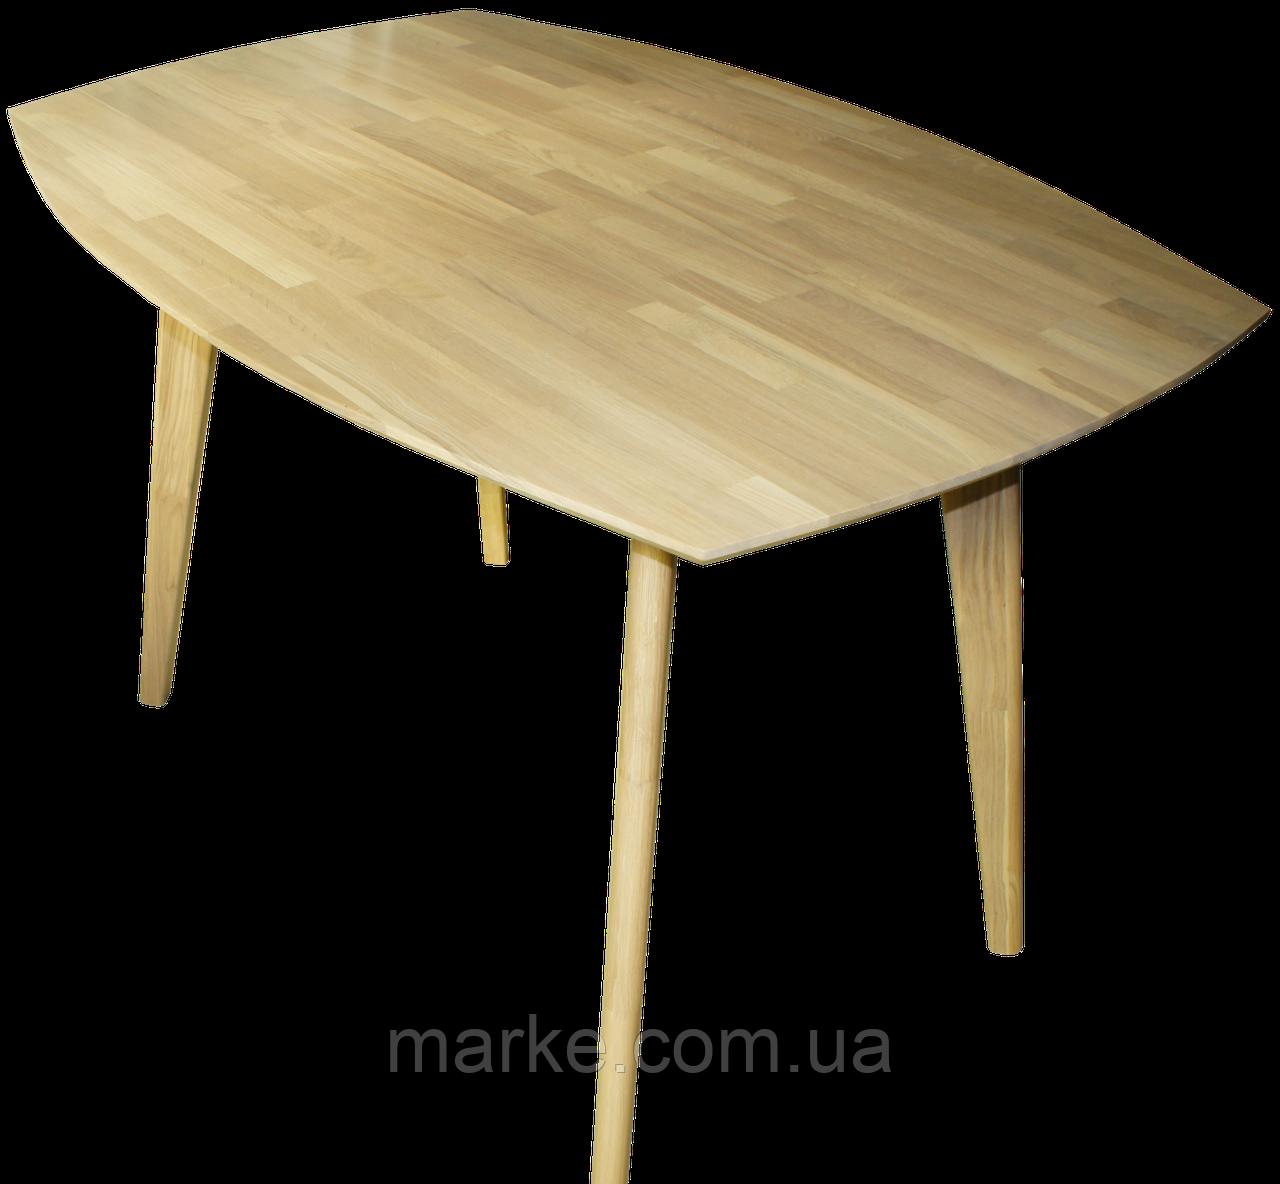 "Нераскладной деревянній стол ""Nordiс R"" 160*80 см"